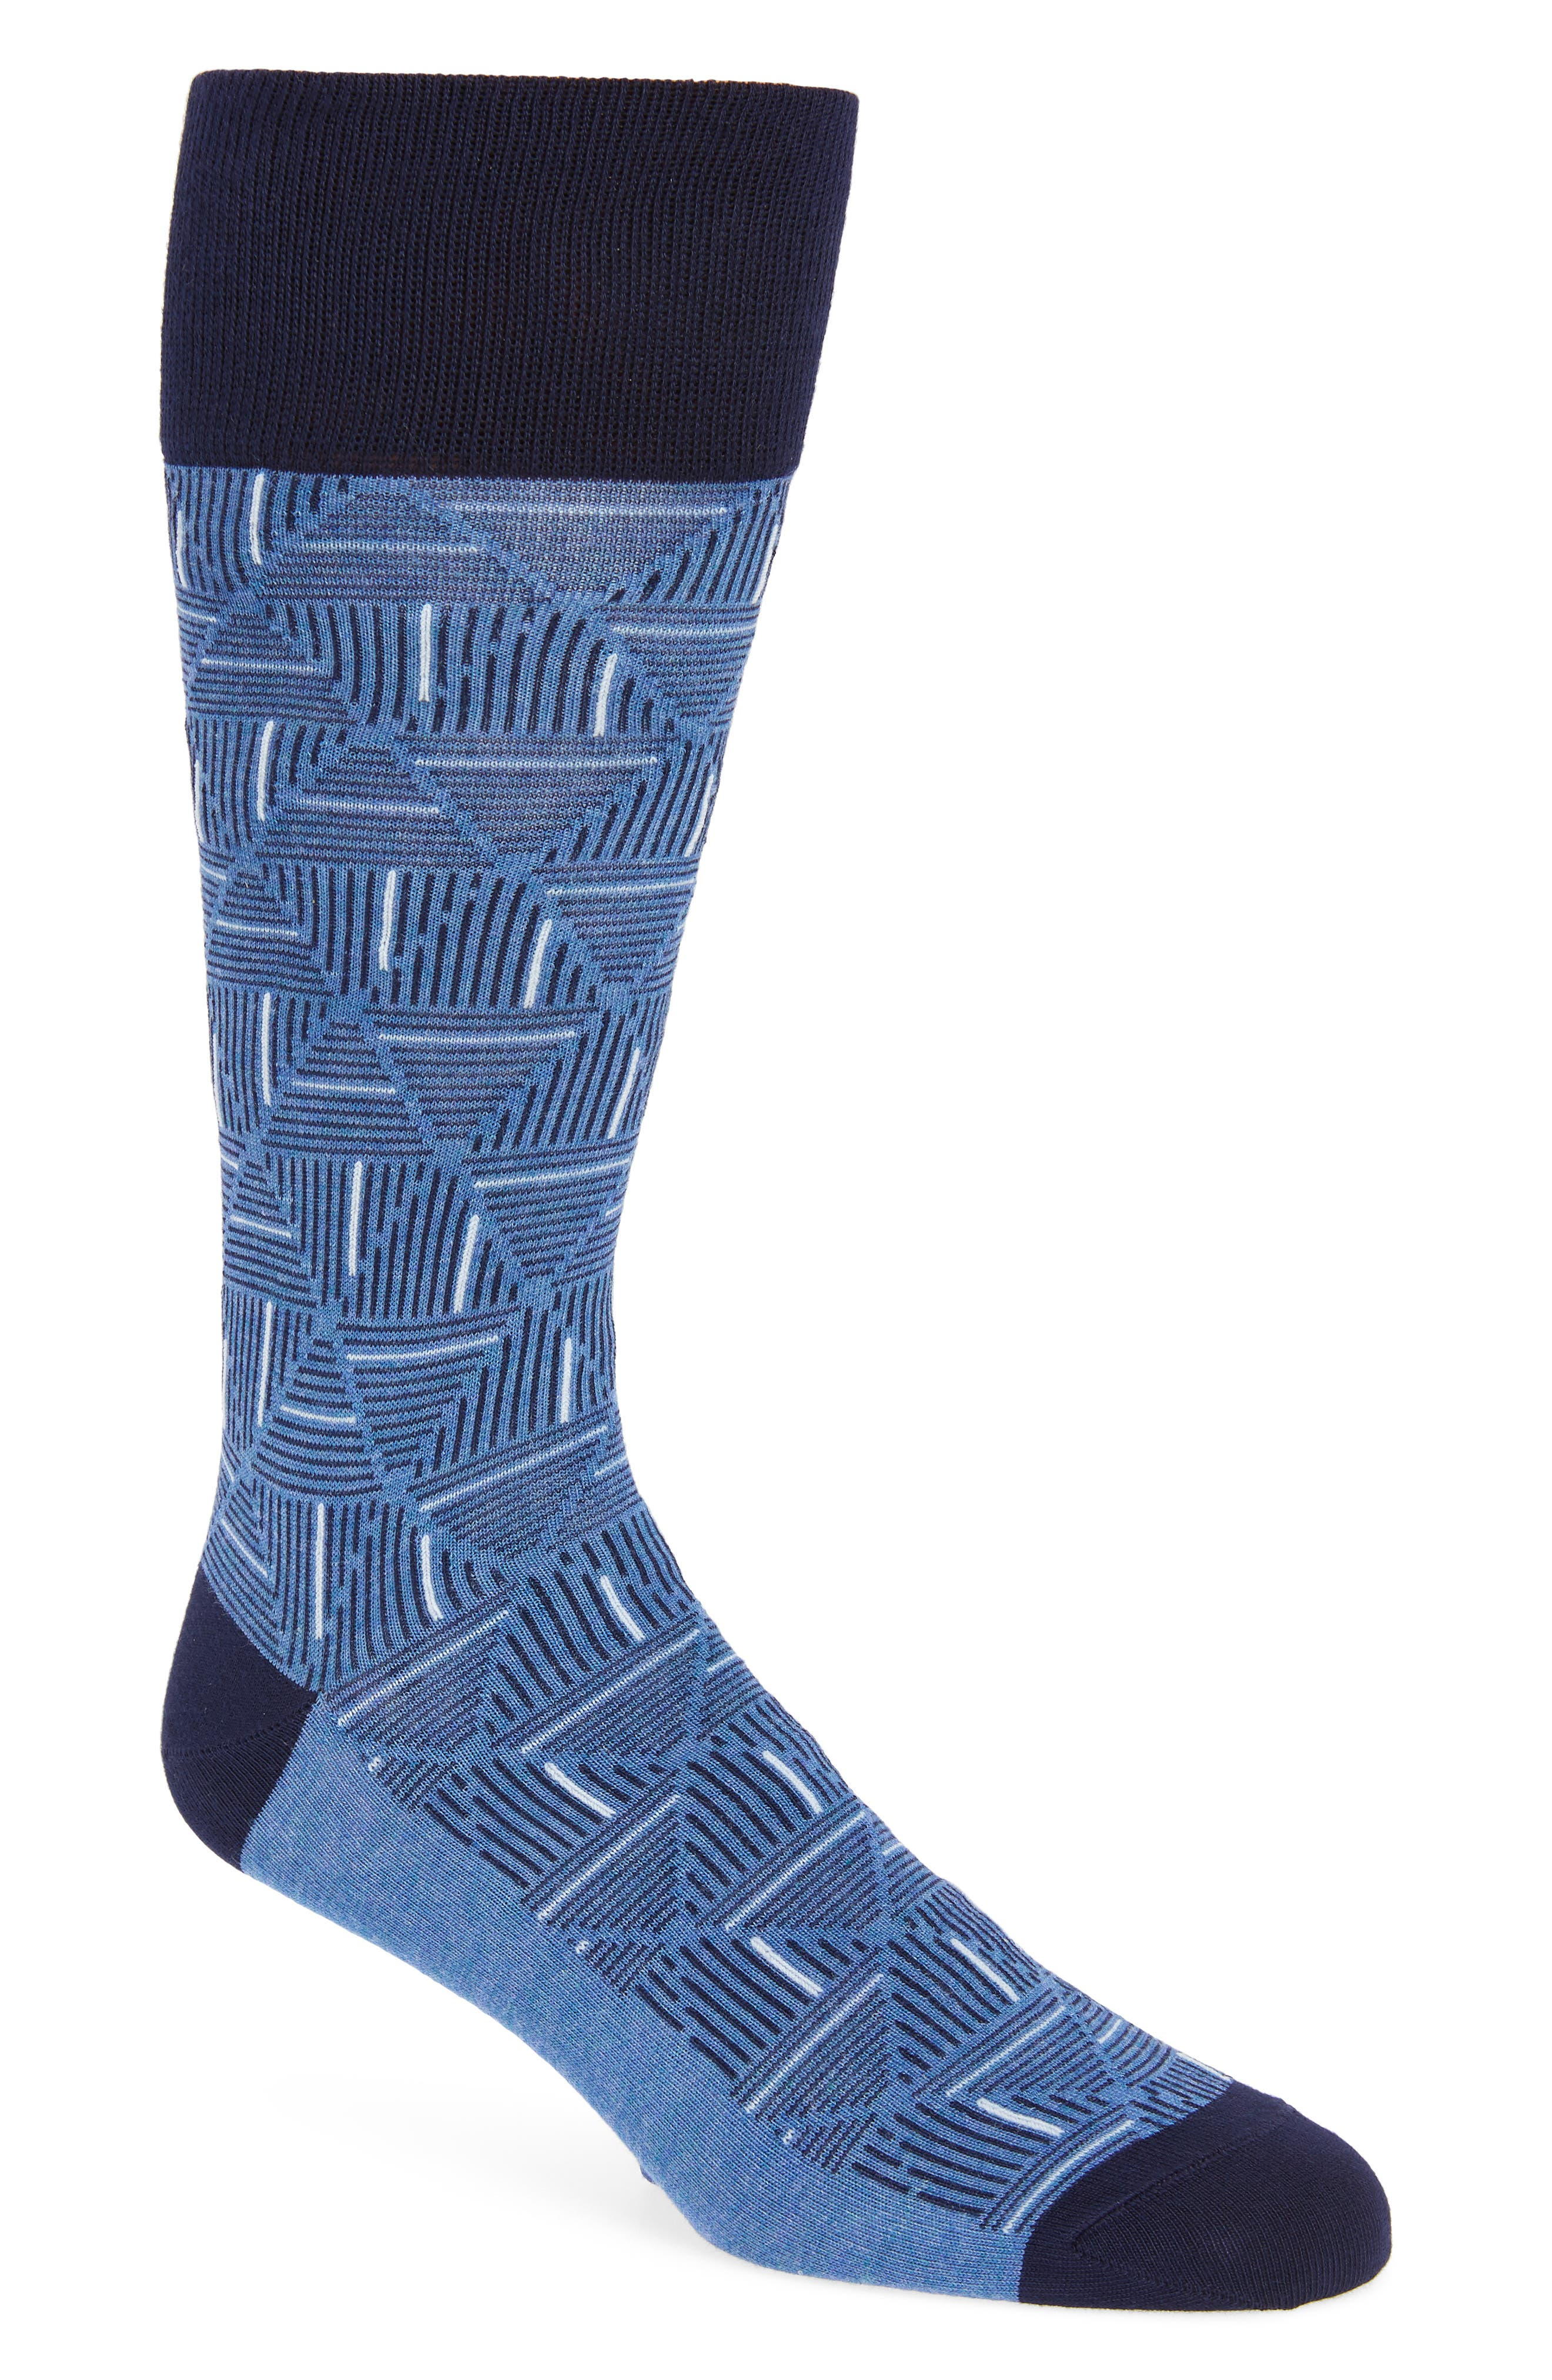 Triangle Lines Geometric Socks,                             Main thumbnail 1, color,                             401